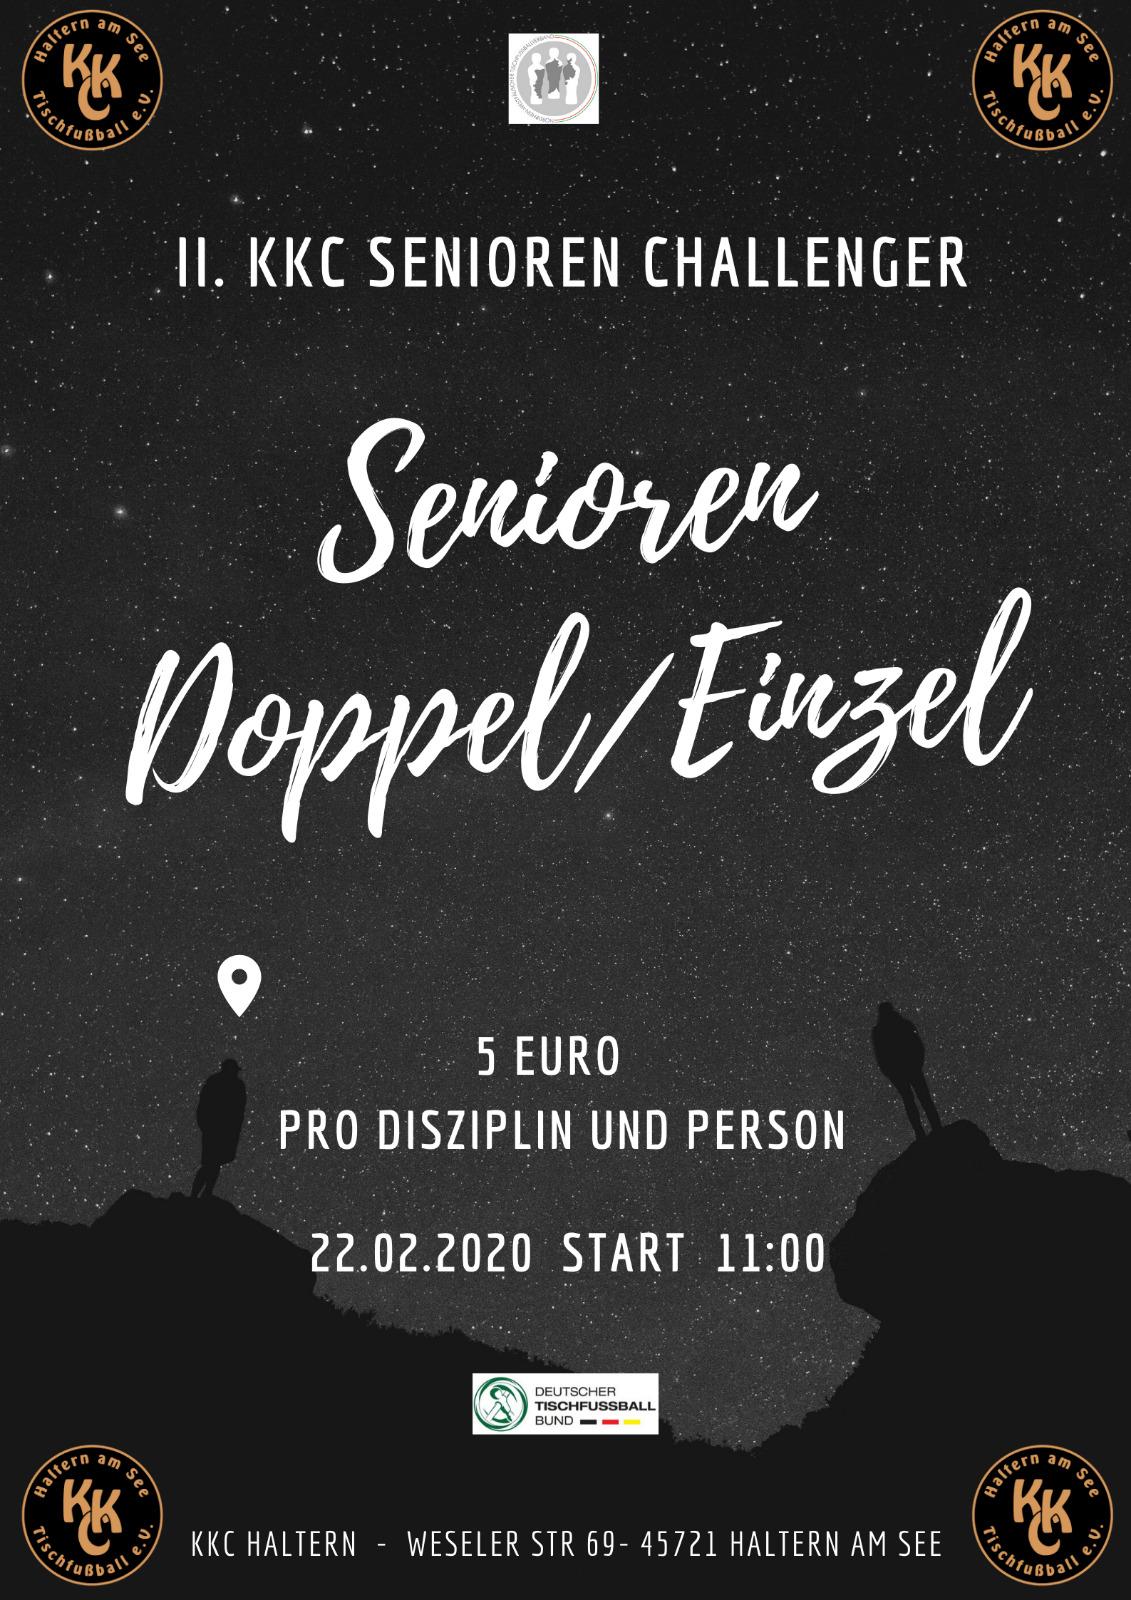 II. KKC Senioren Challenger